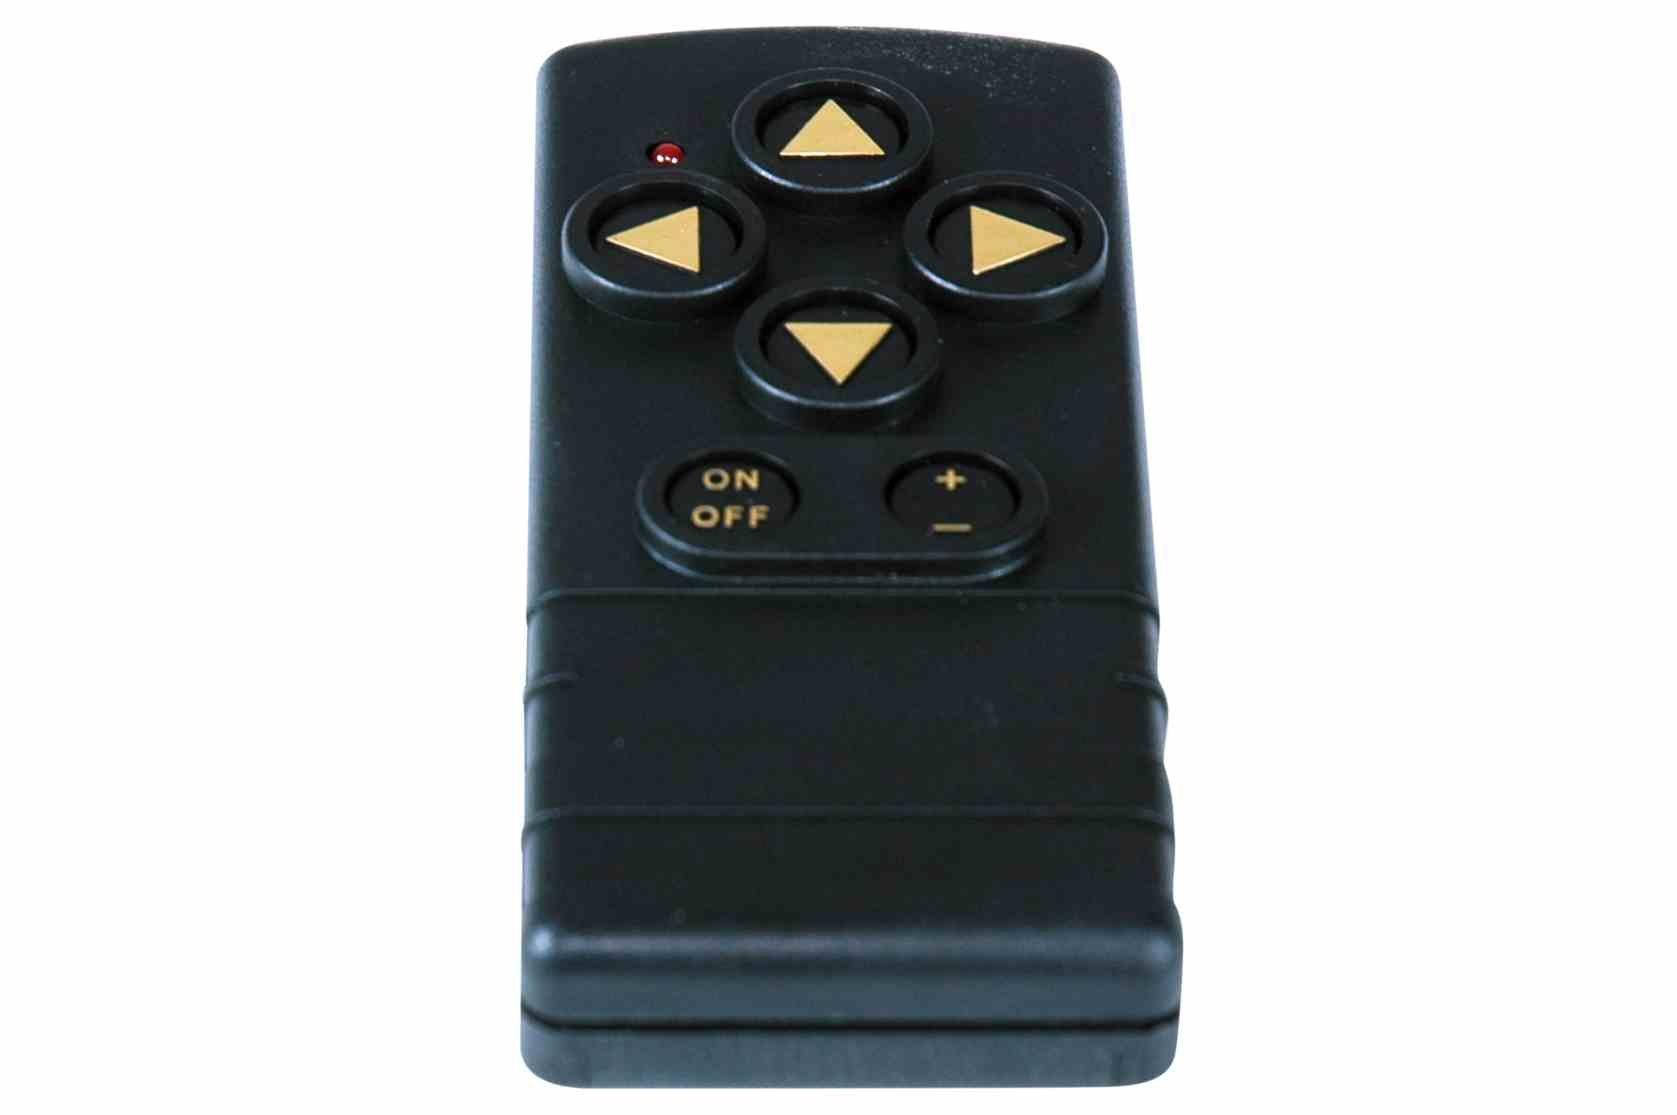 Handheld Remote Control for Golight Radioray Remote Control Spotlights GL-7900T(-Old)